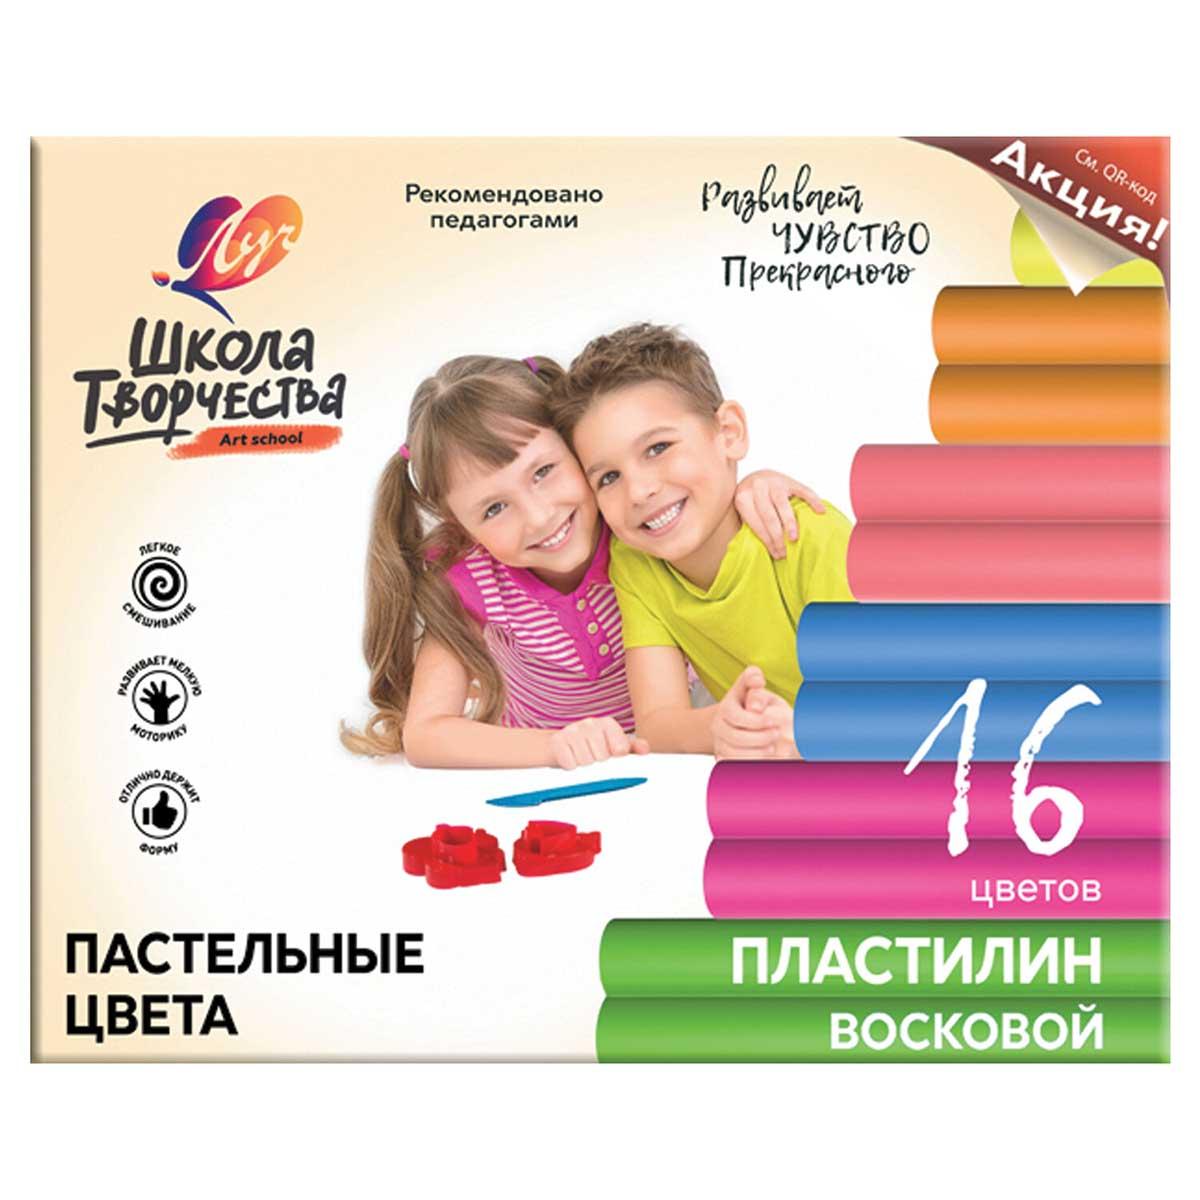 29С 1772-08 Пластилин восковой 'Школа творчества' 16 цветов